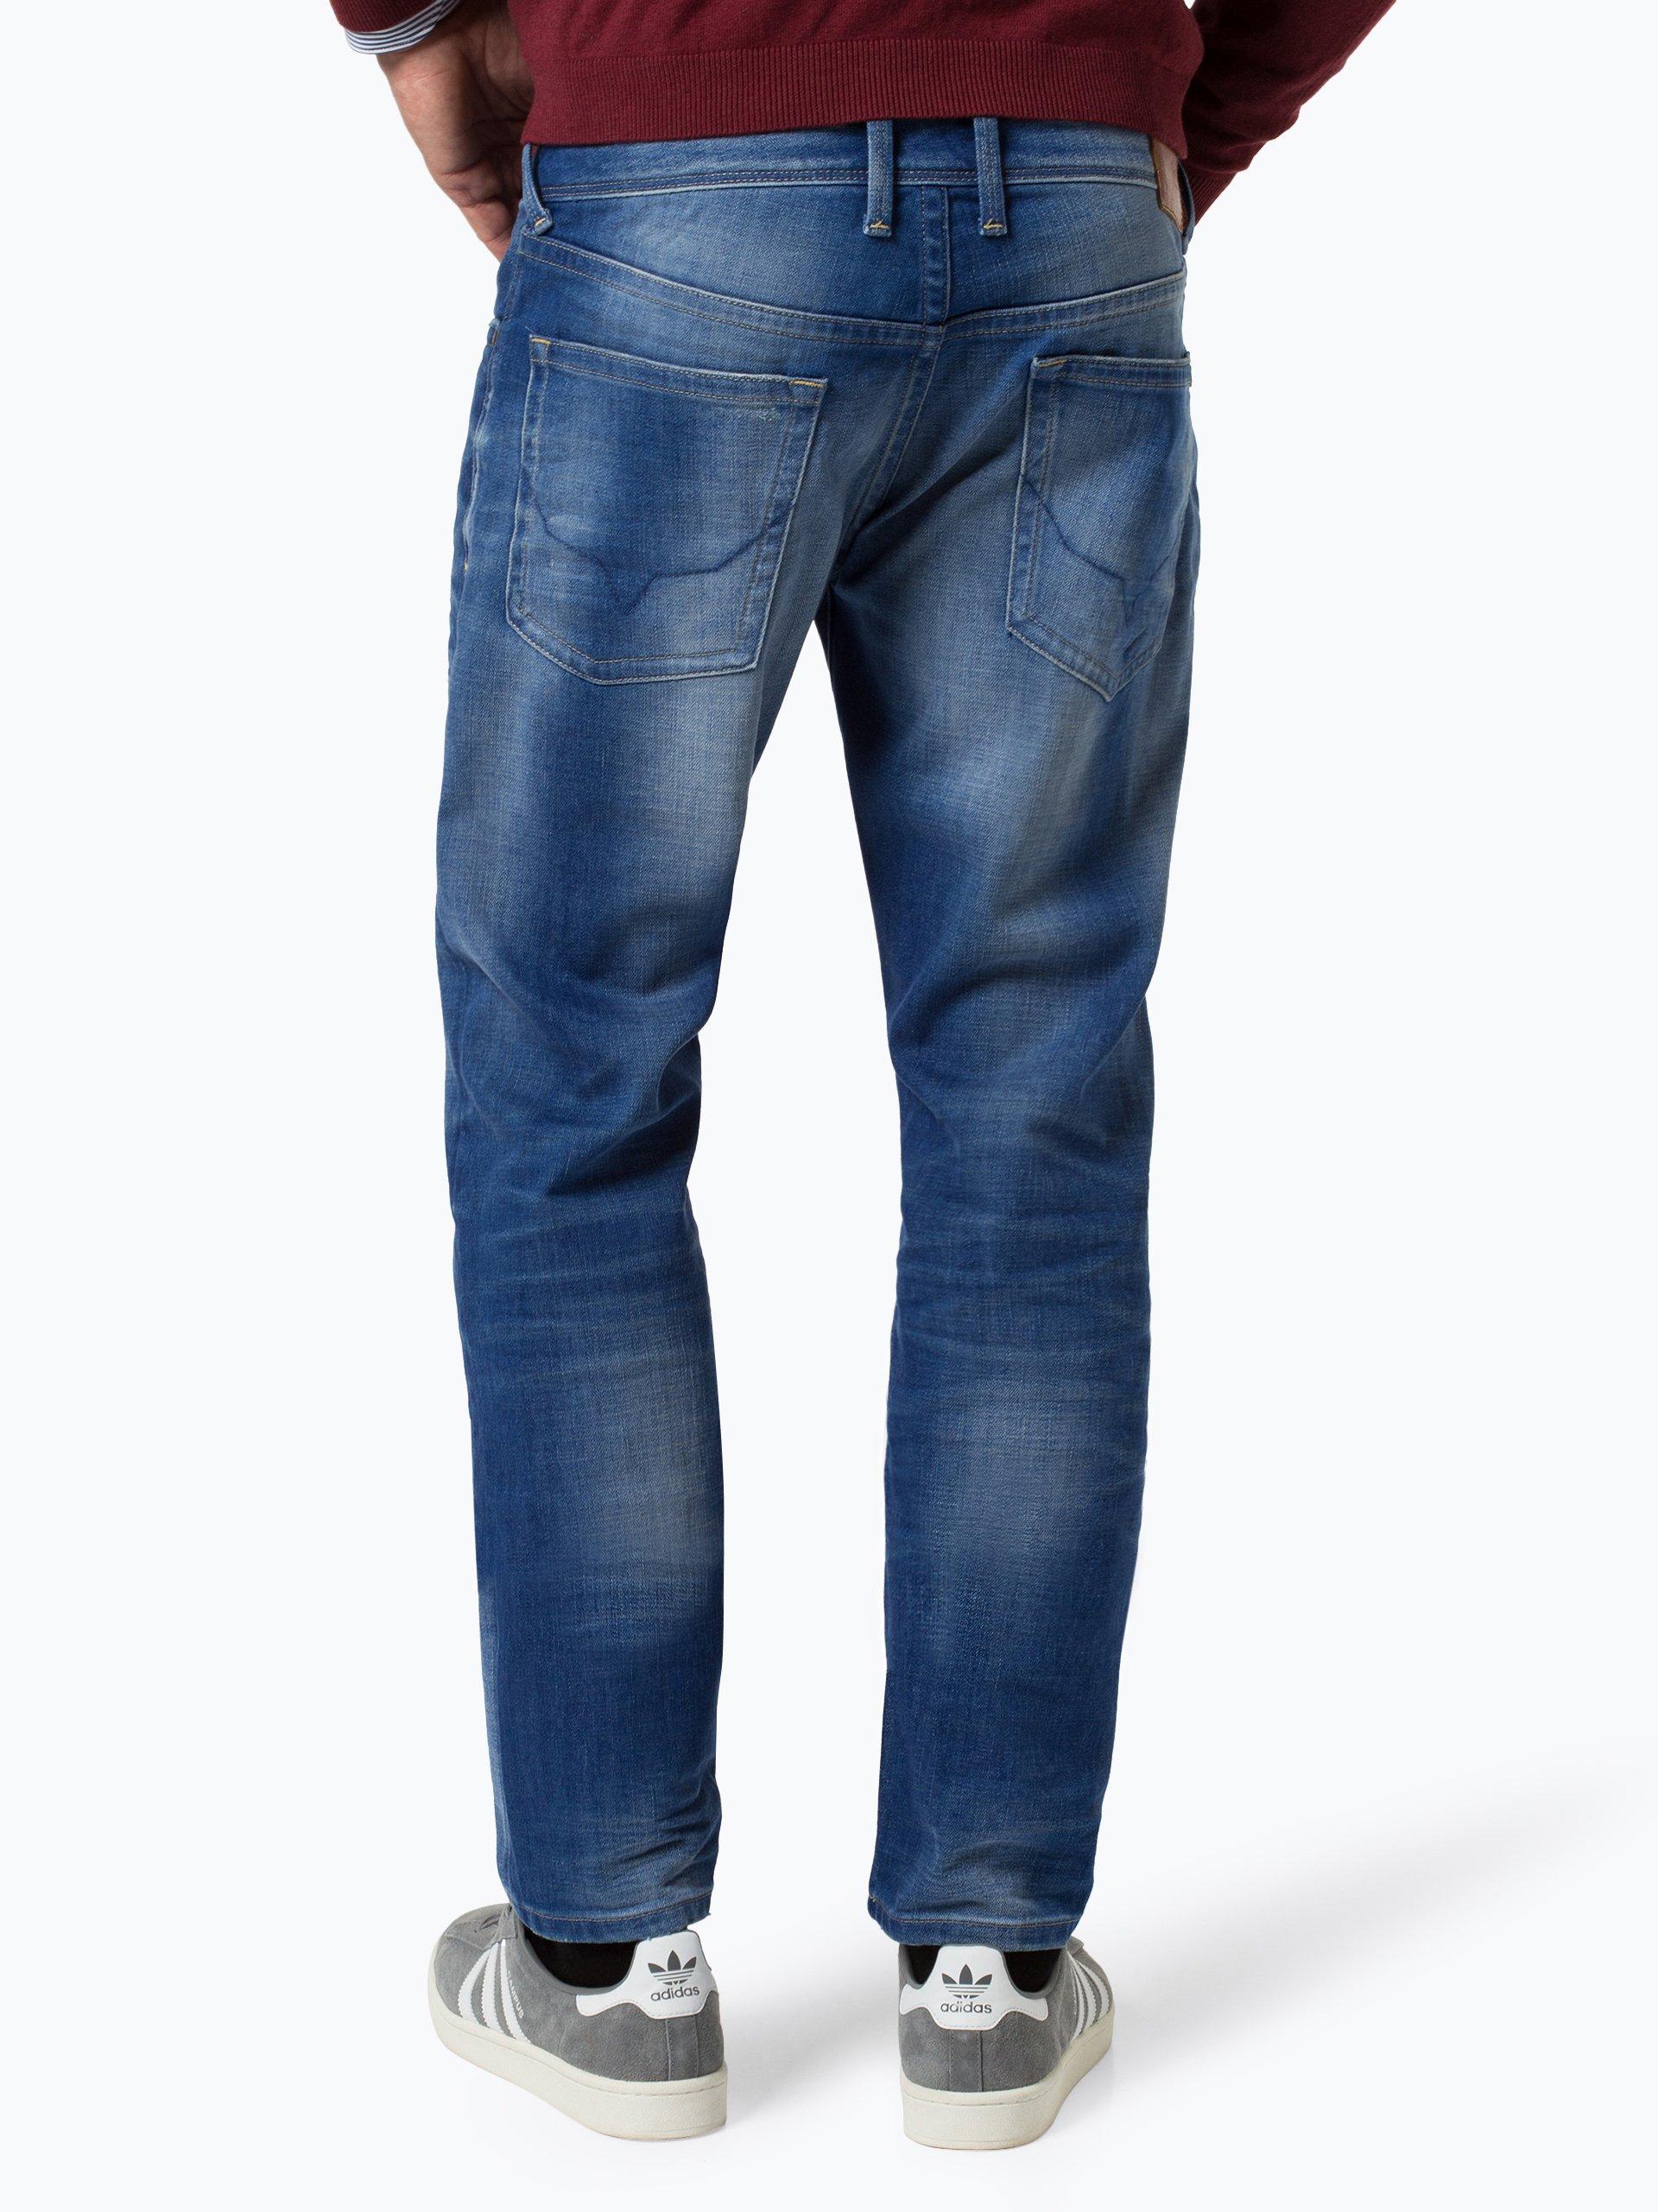 pepe jeans herren jeans hatch denim uni online kaufen vangraaf com. Black Bedroom Furniture Sets. Home Design Ideas